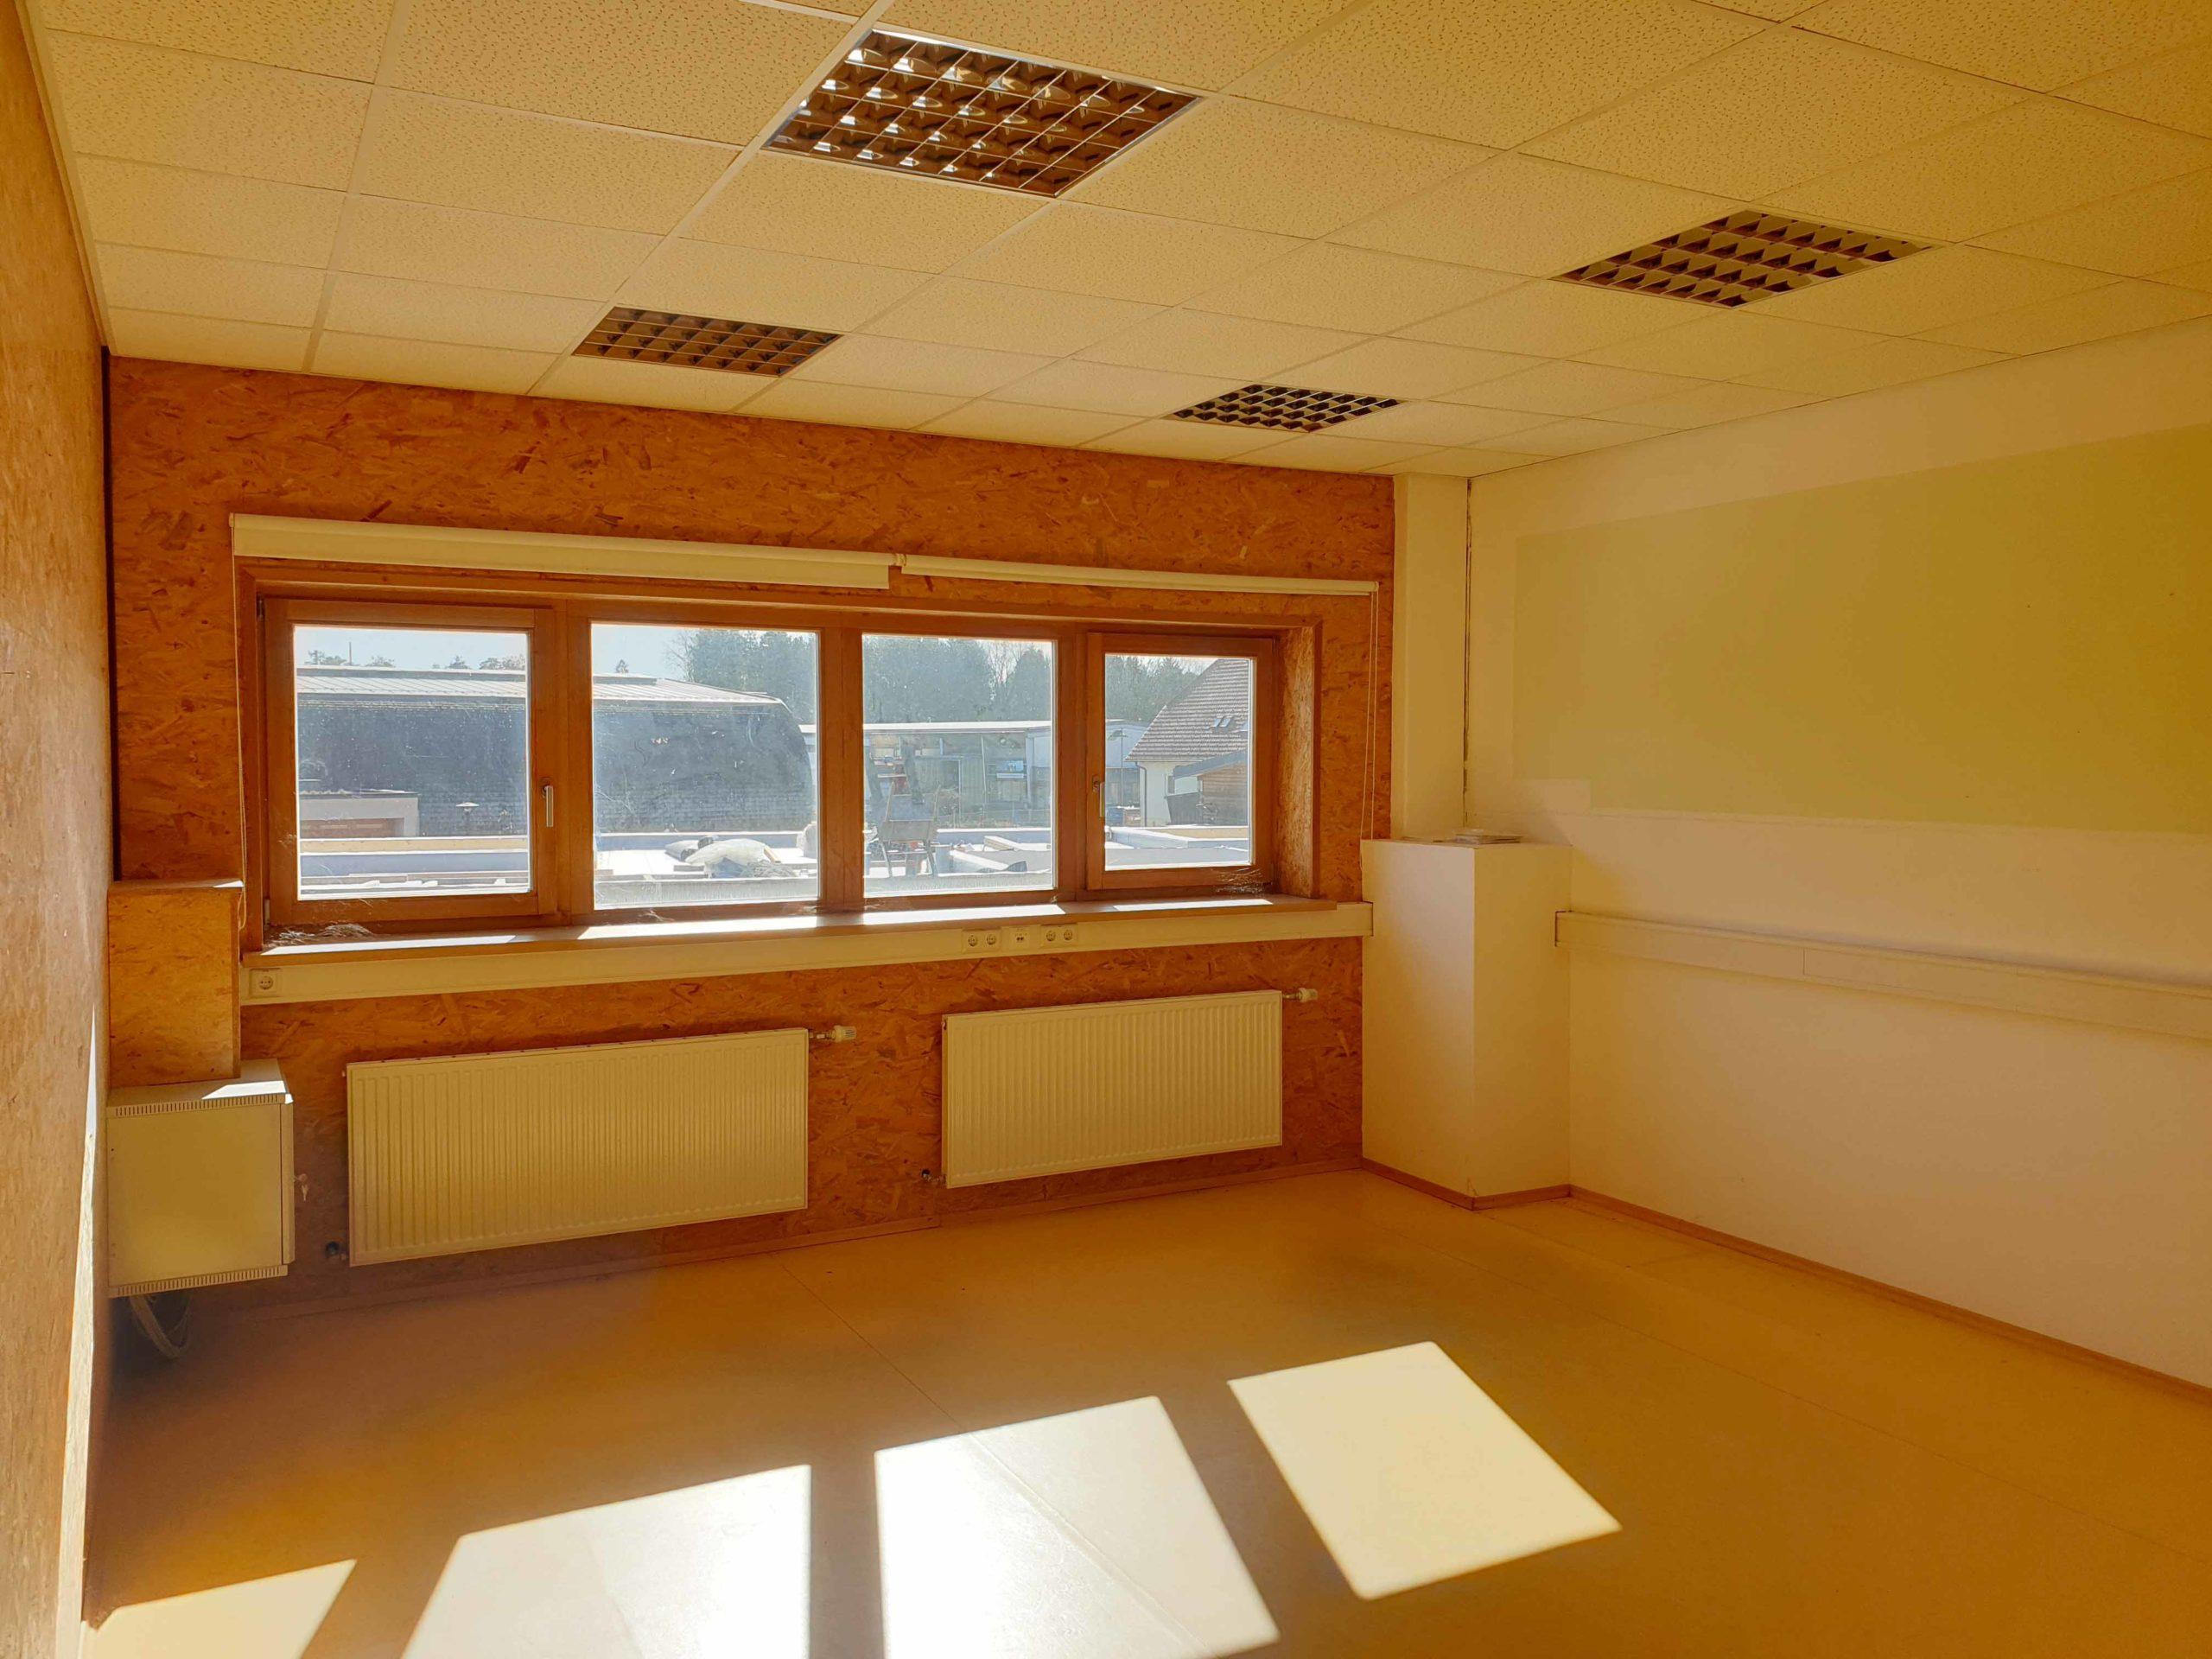 Bürofläche in der Solarhalle am Ökopark Hartberg